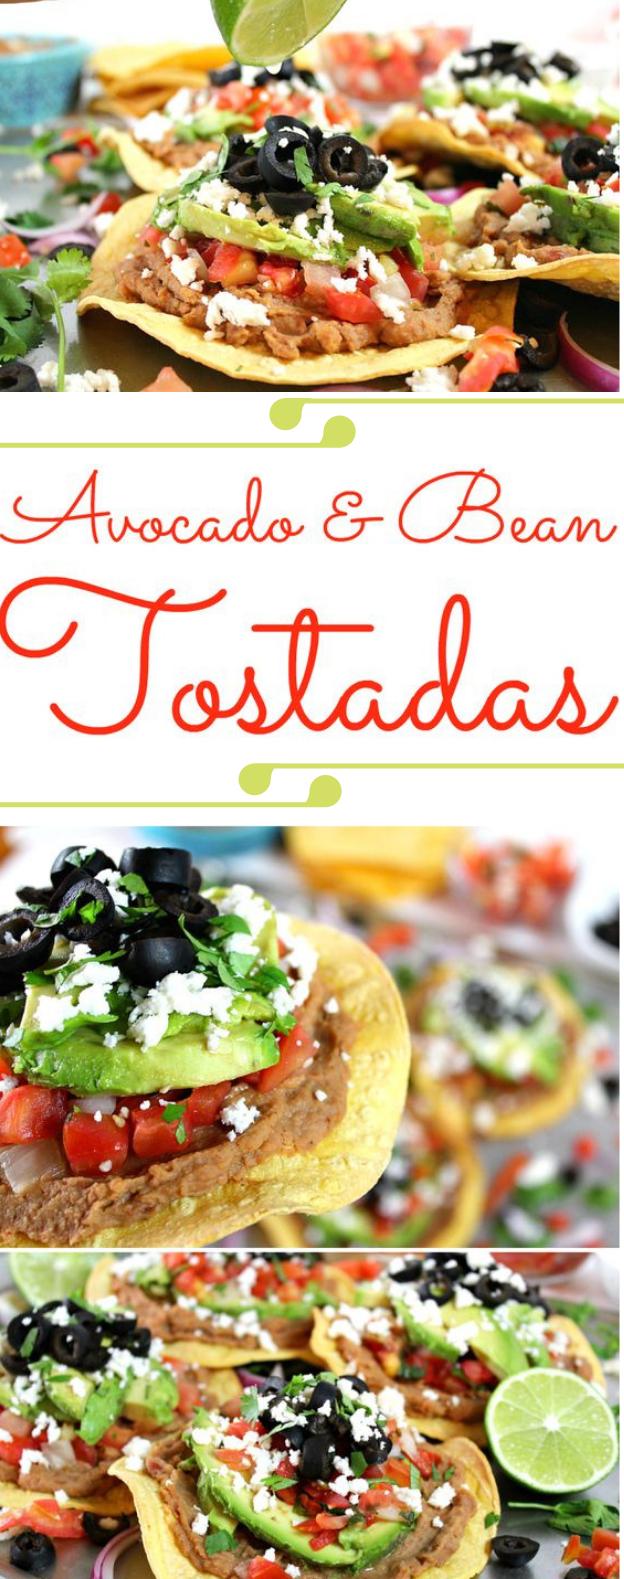 Easy Vegetarian Tostadas #vegetarian #tostadas